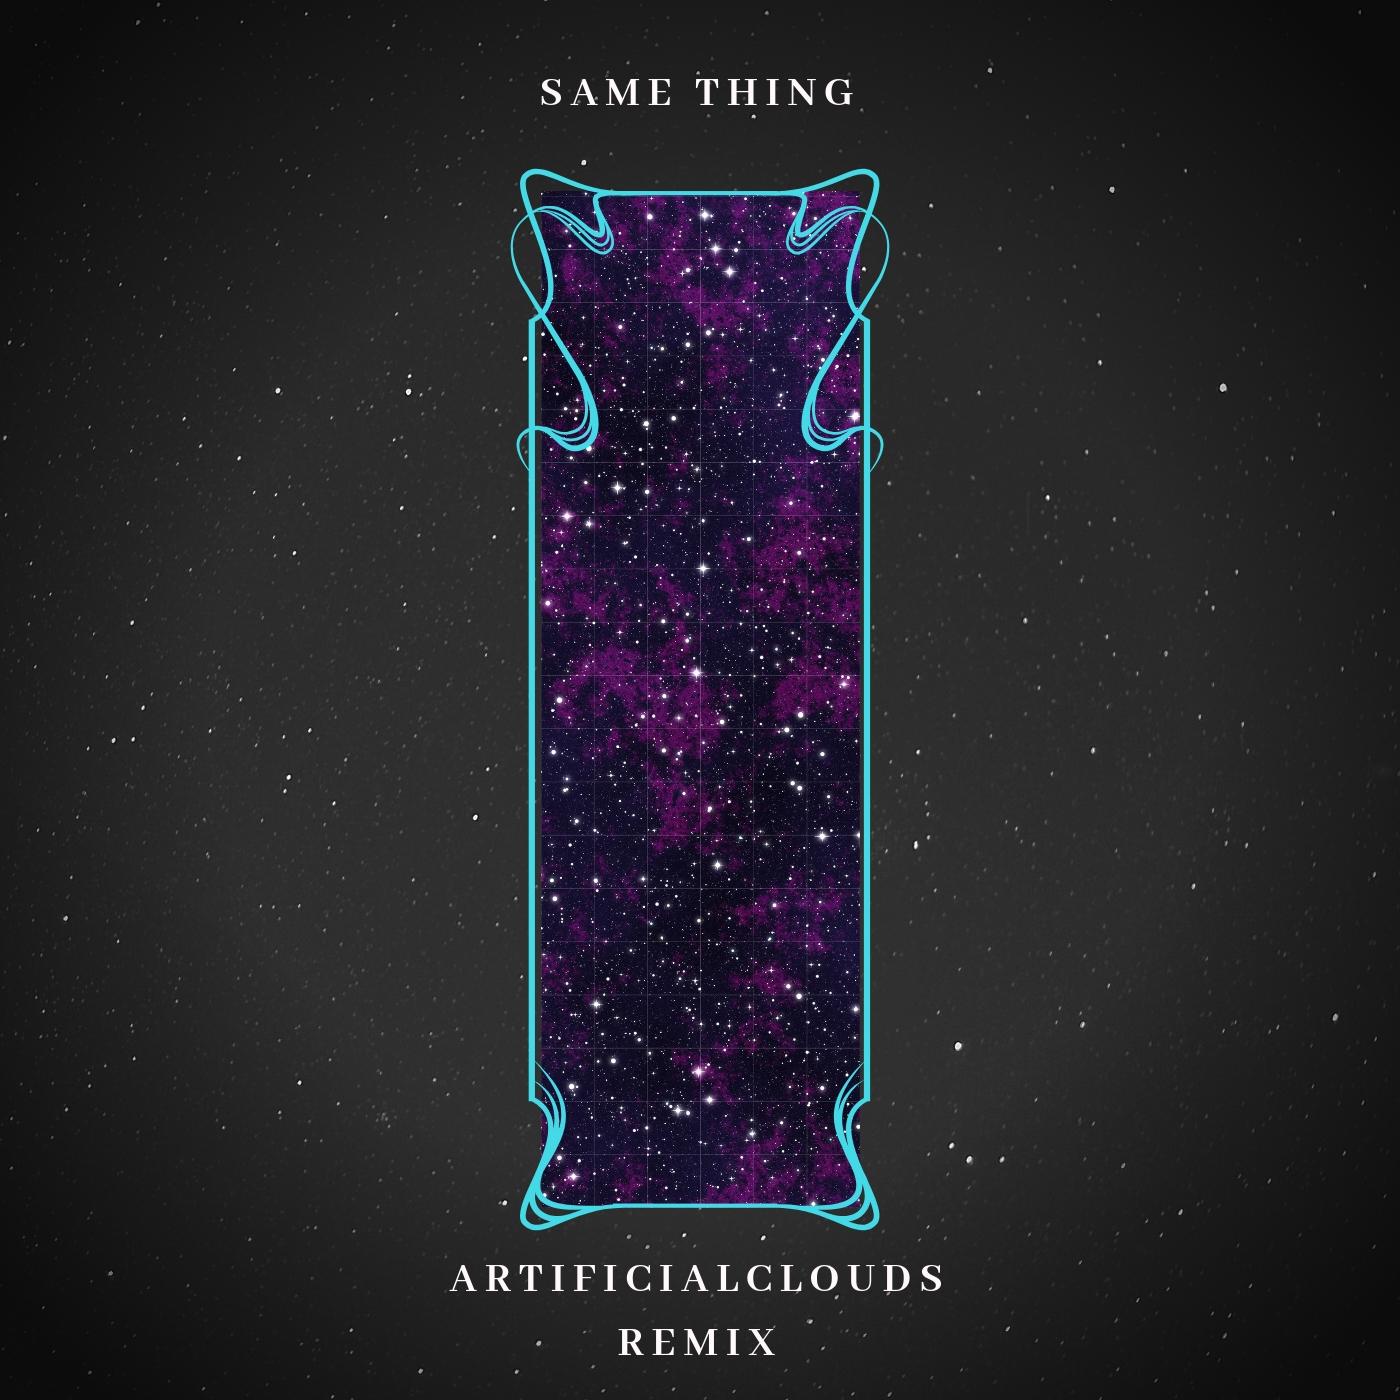 Same Thing ArtificialClouds Remix Album Artwork